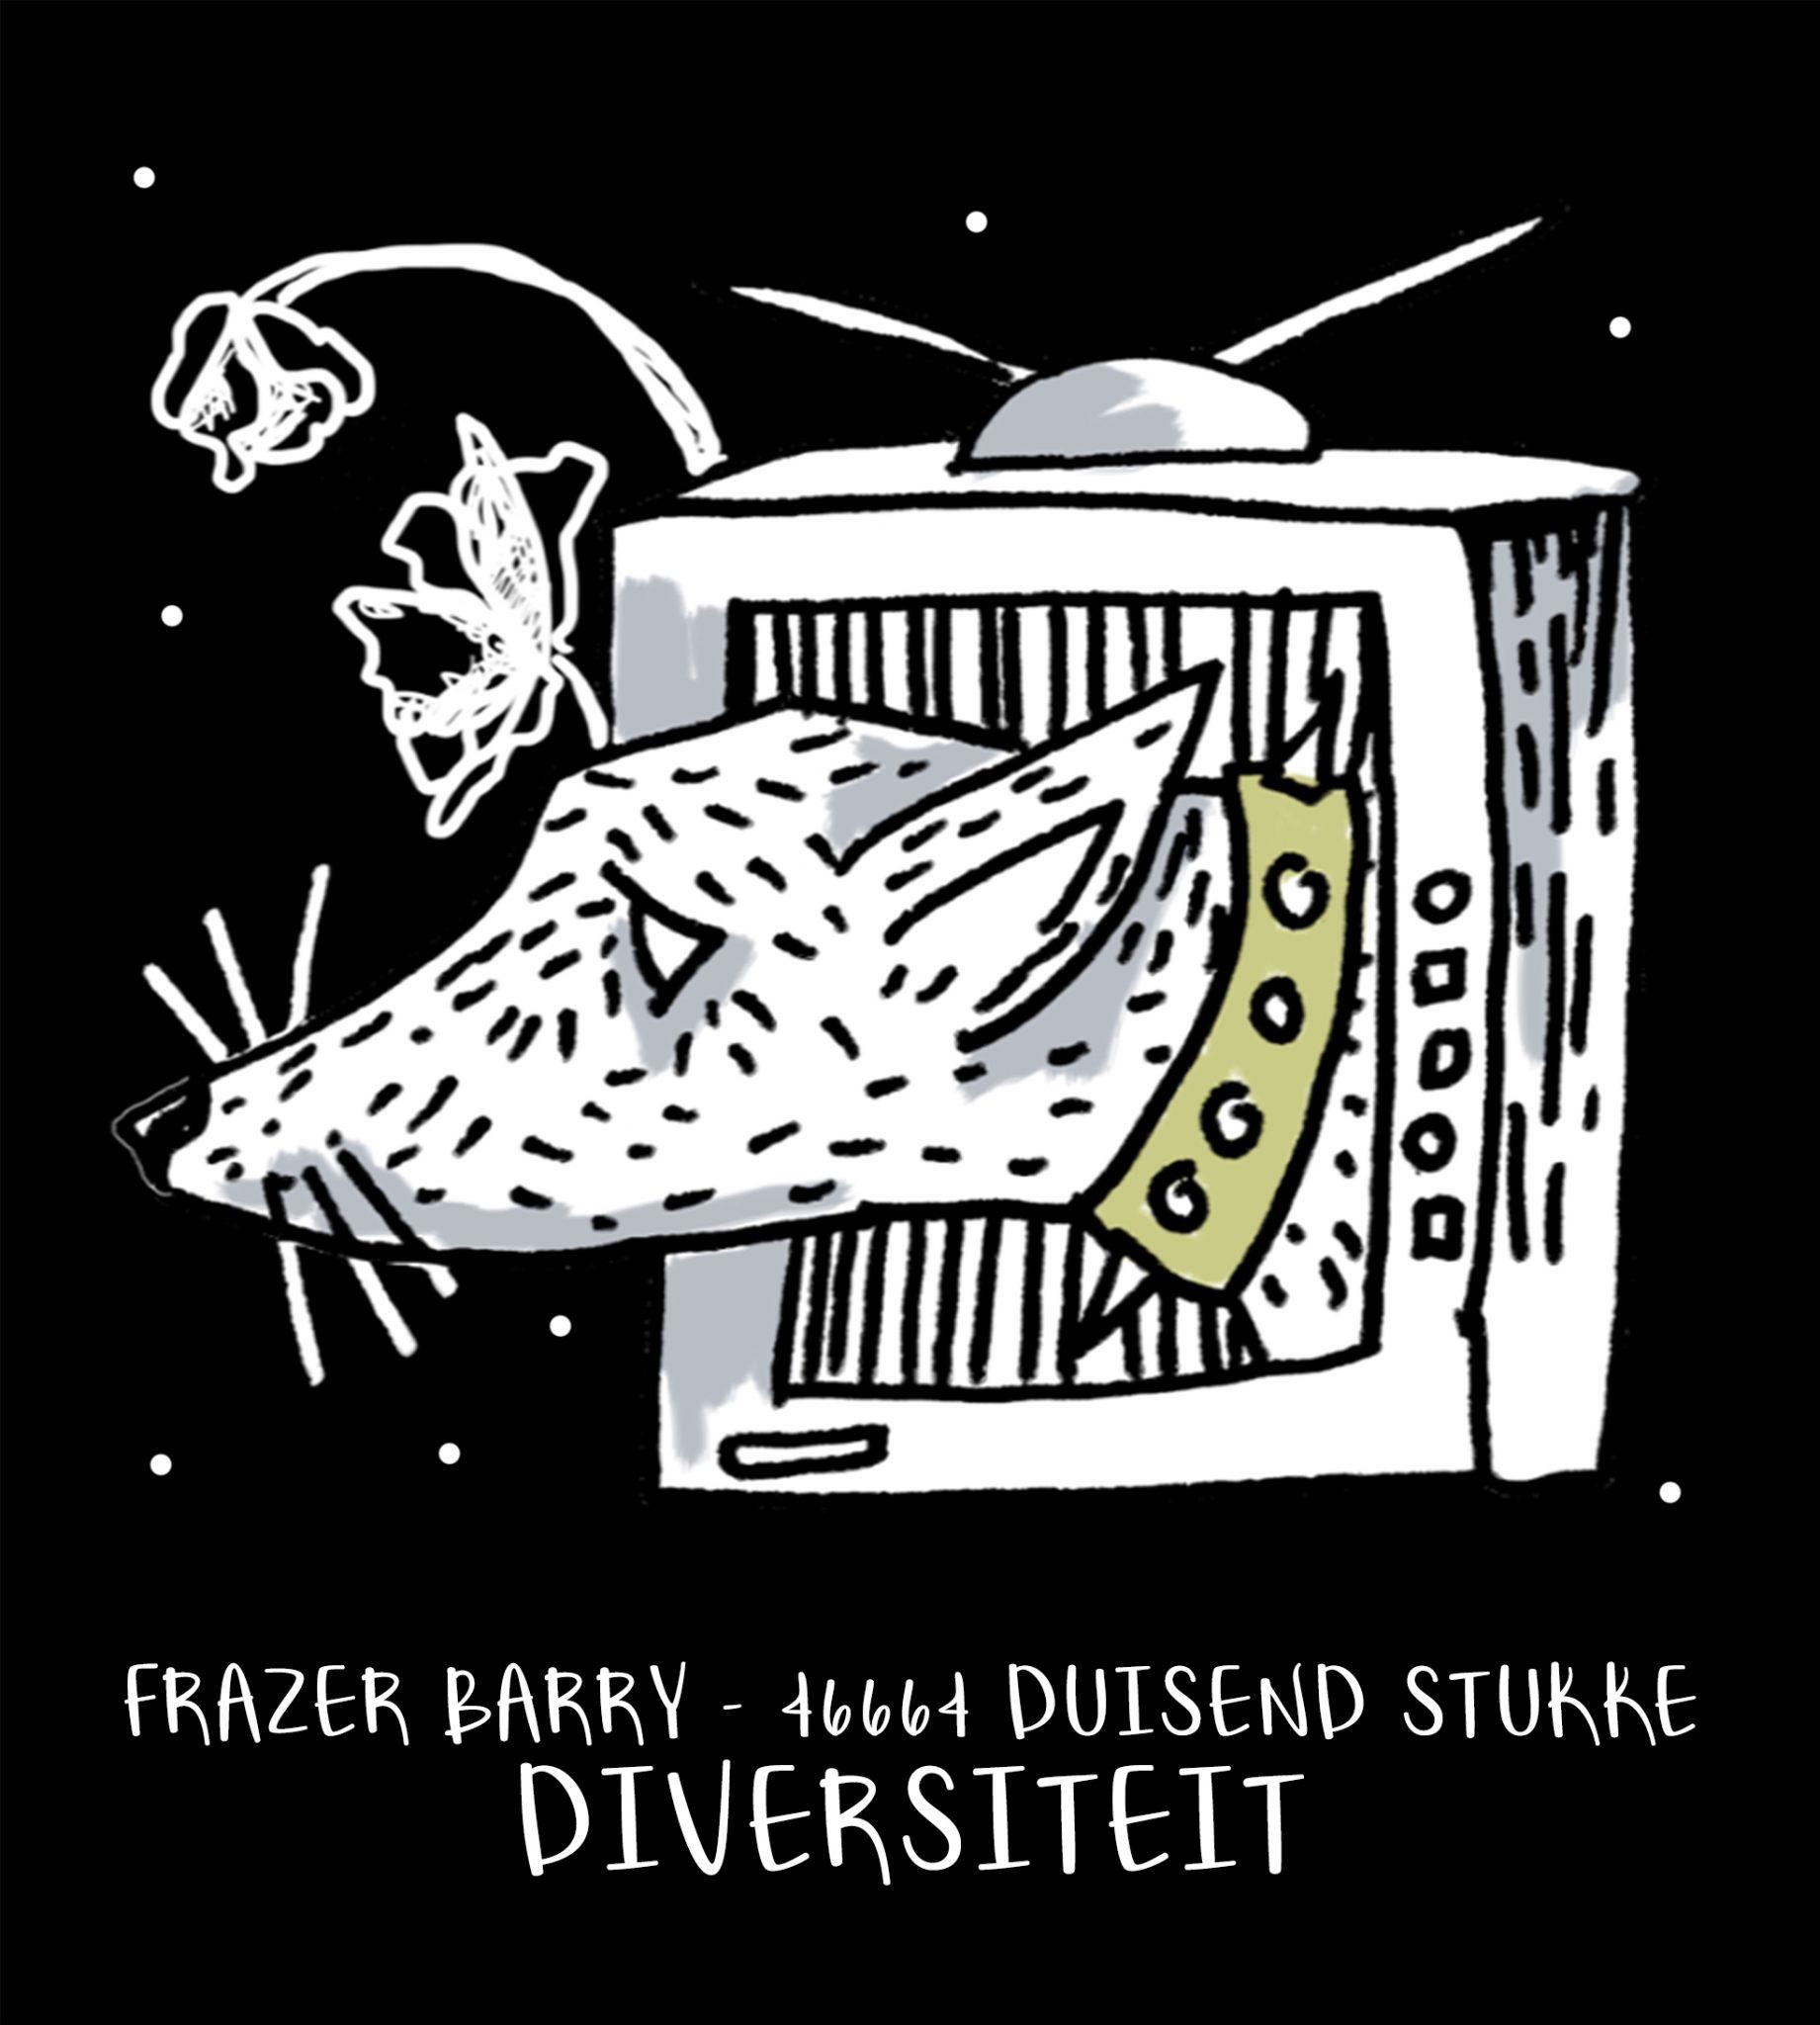 Copy of Frazer Barry 46664 - Duisend Stukke